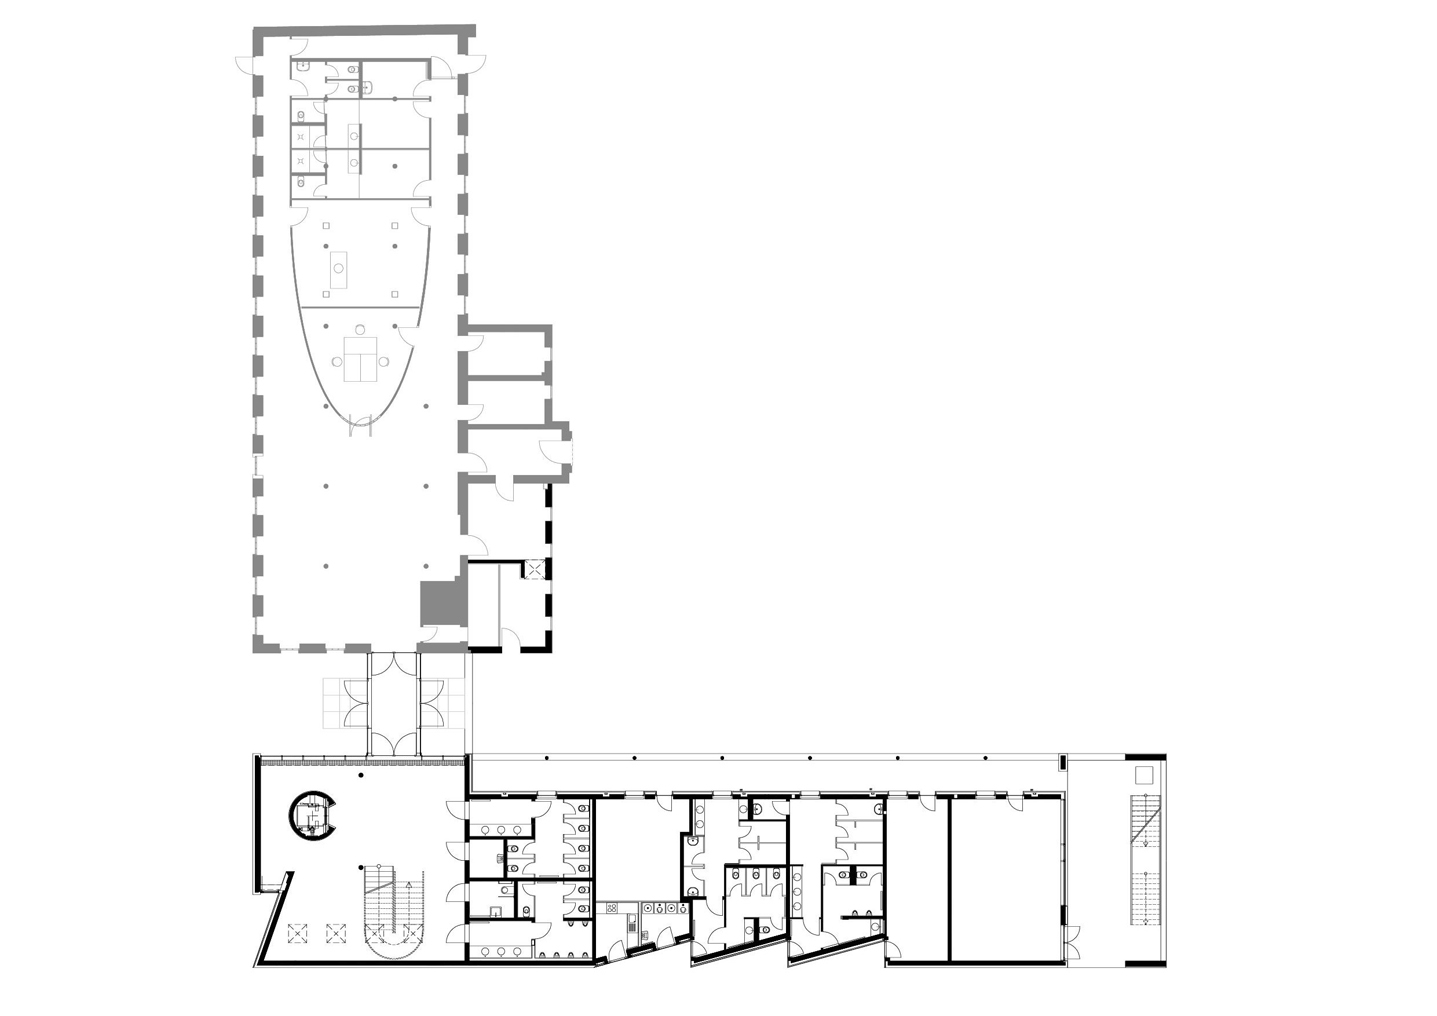 162 Haus des Gastes